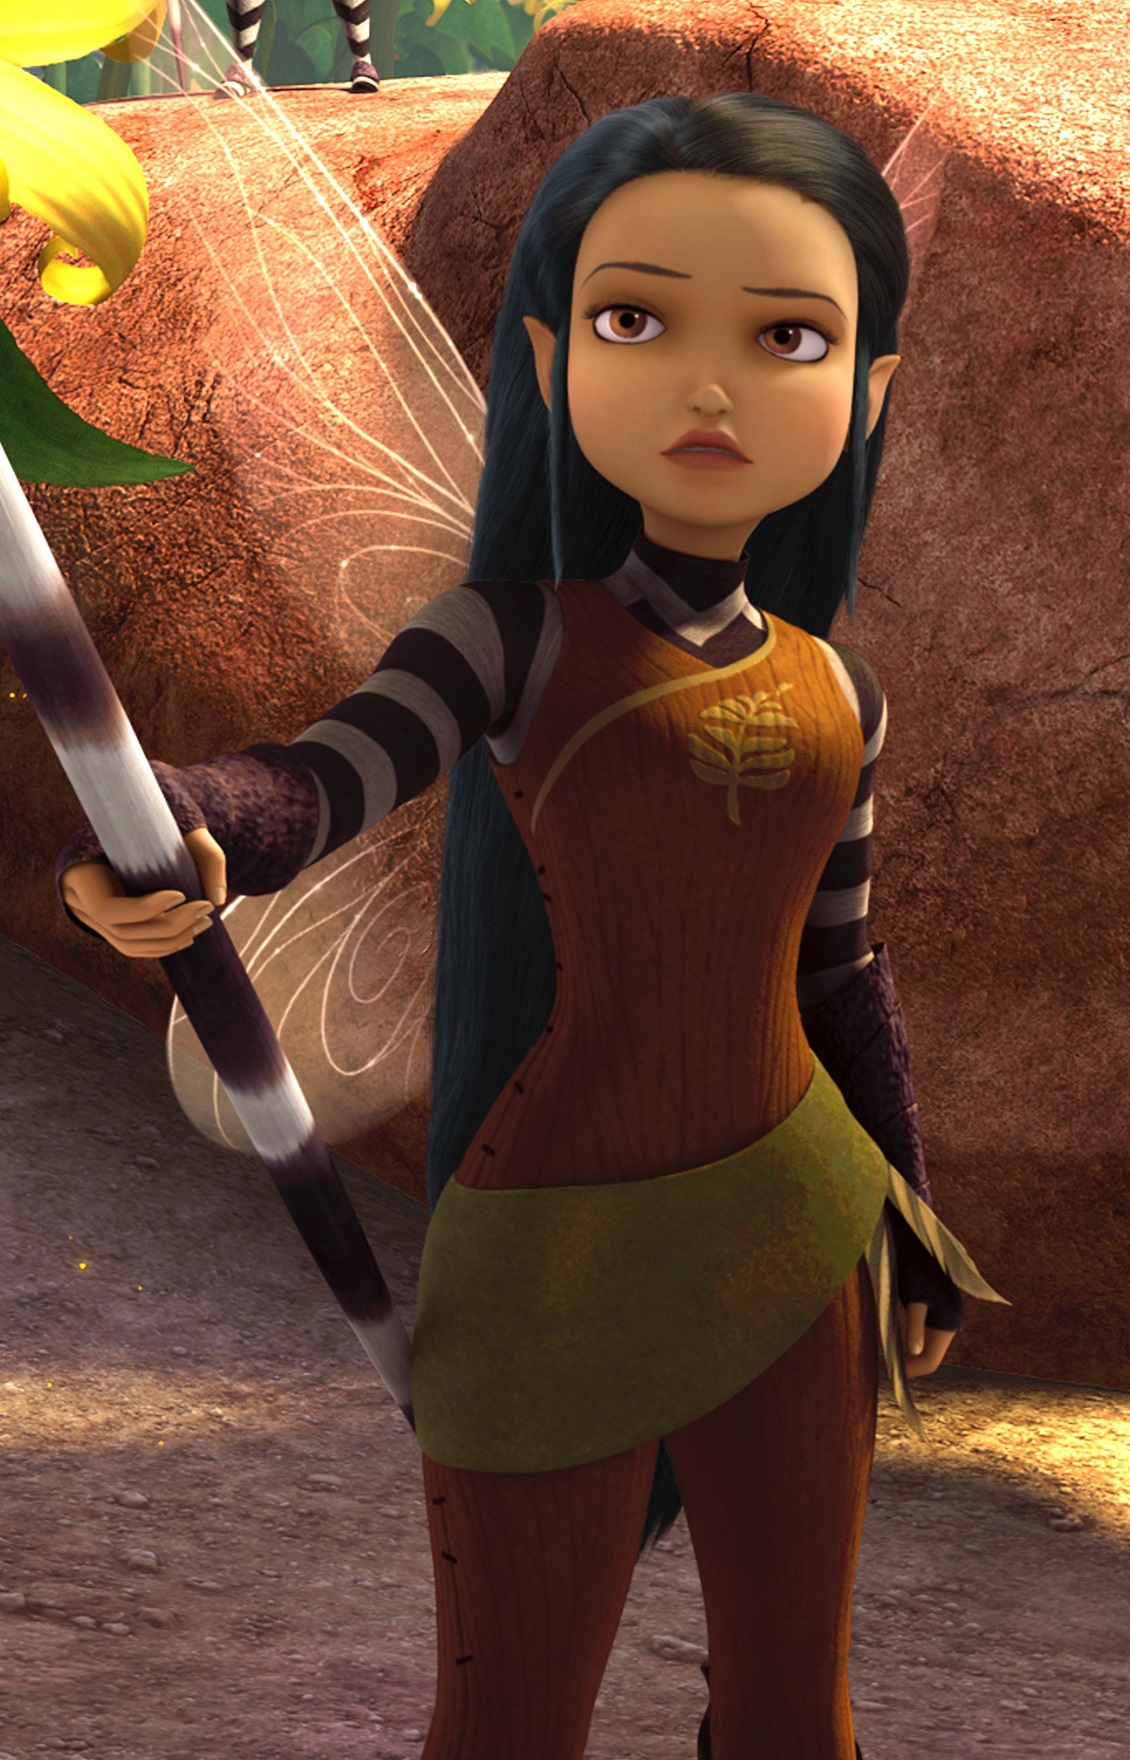 Nyx As Kylie Dupes For 10: Nyx (Disney Fairies)